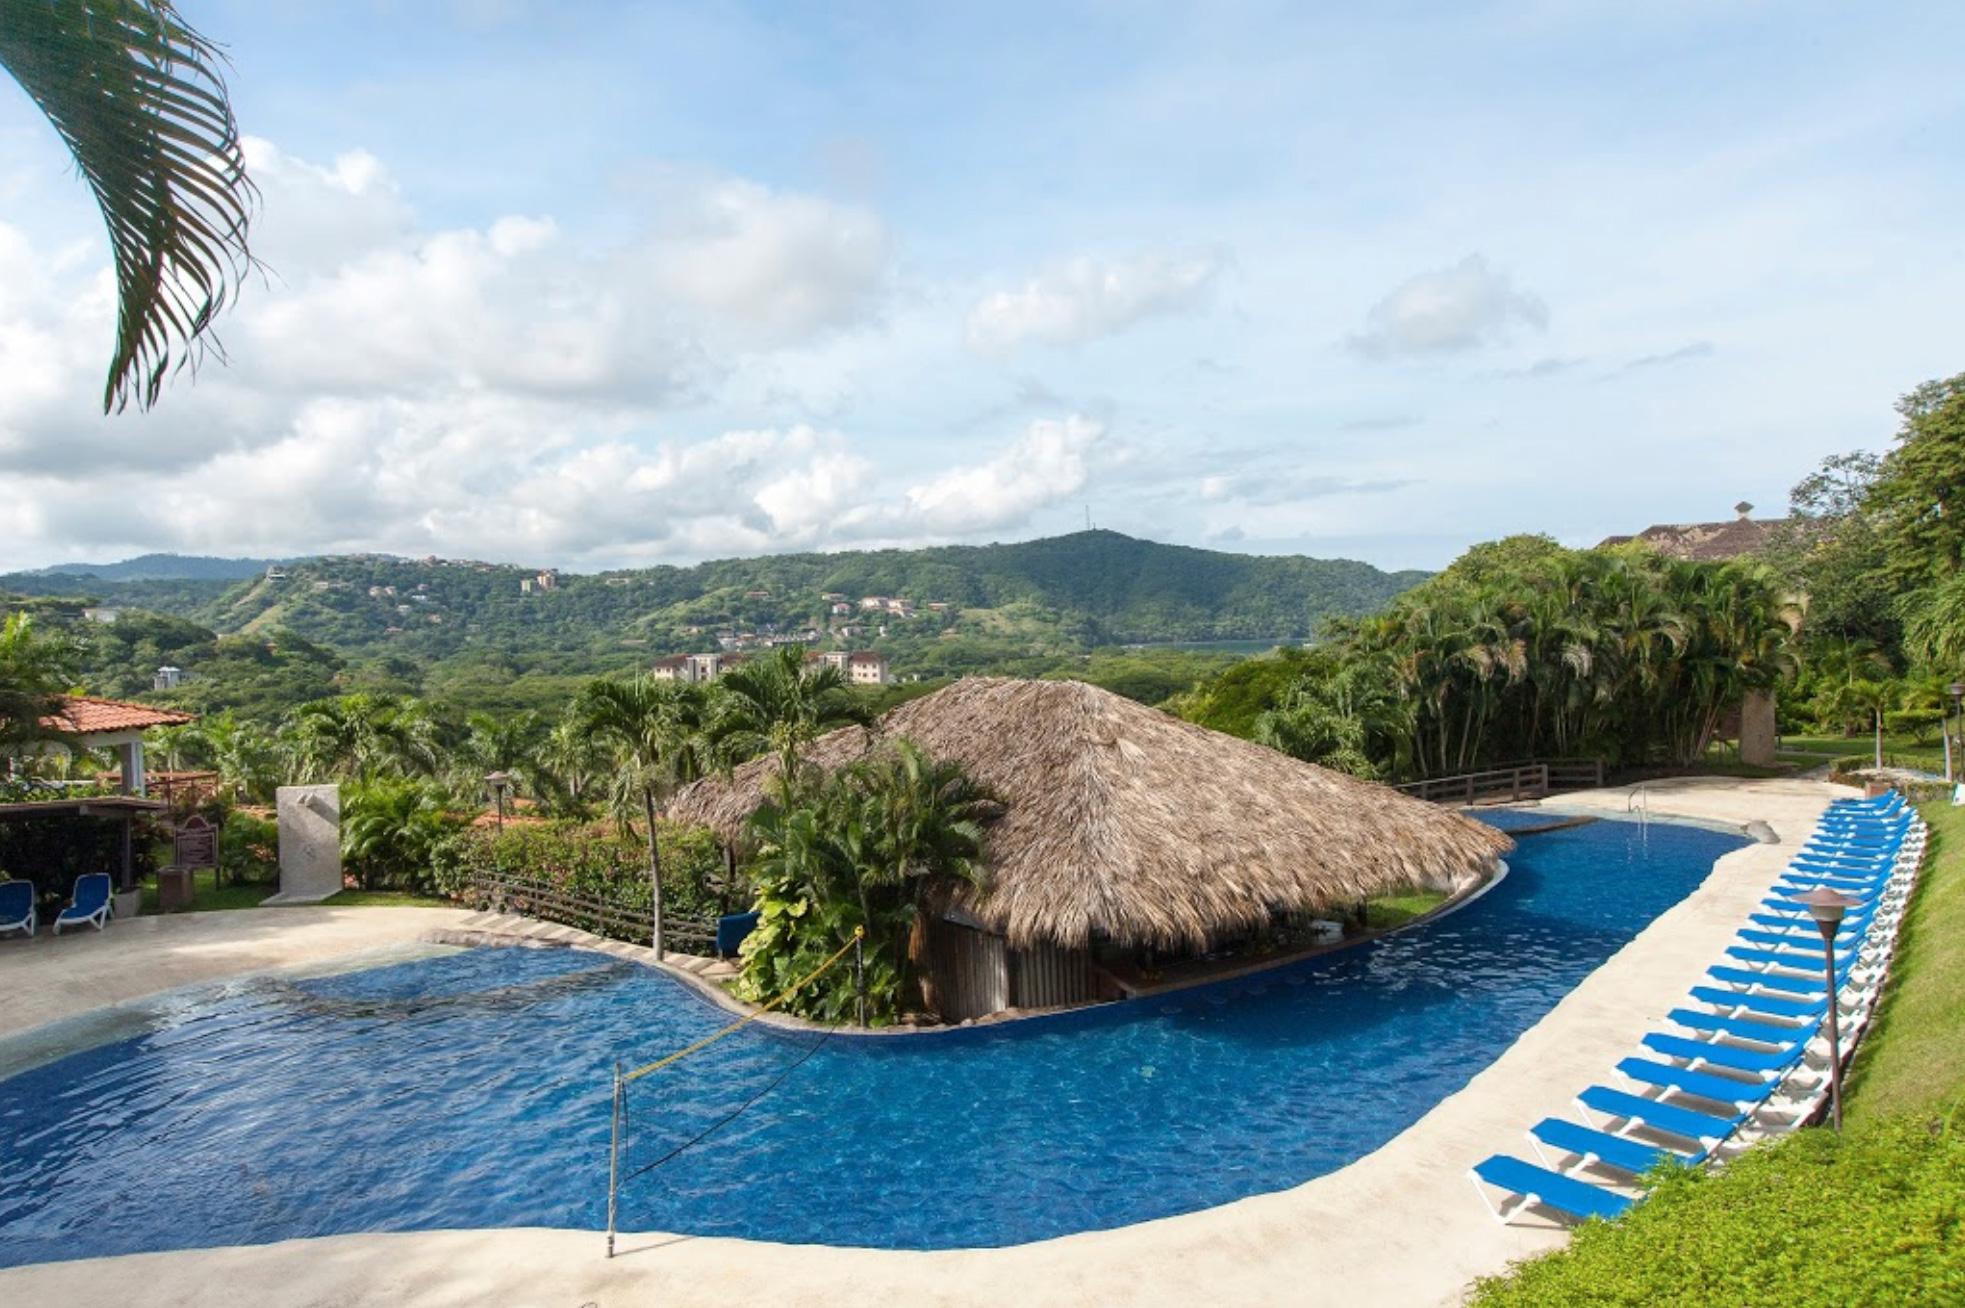 10 luxury costa rica villas route4us for Luxury villas in costa rica